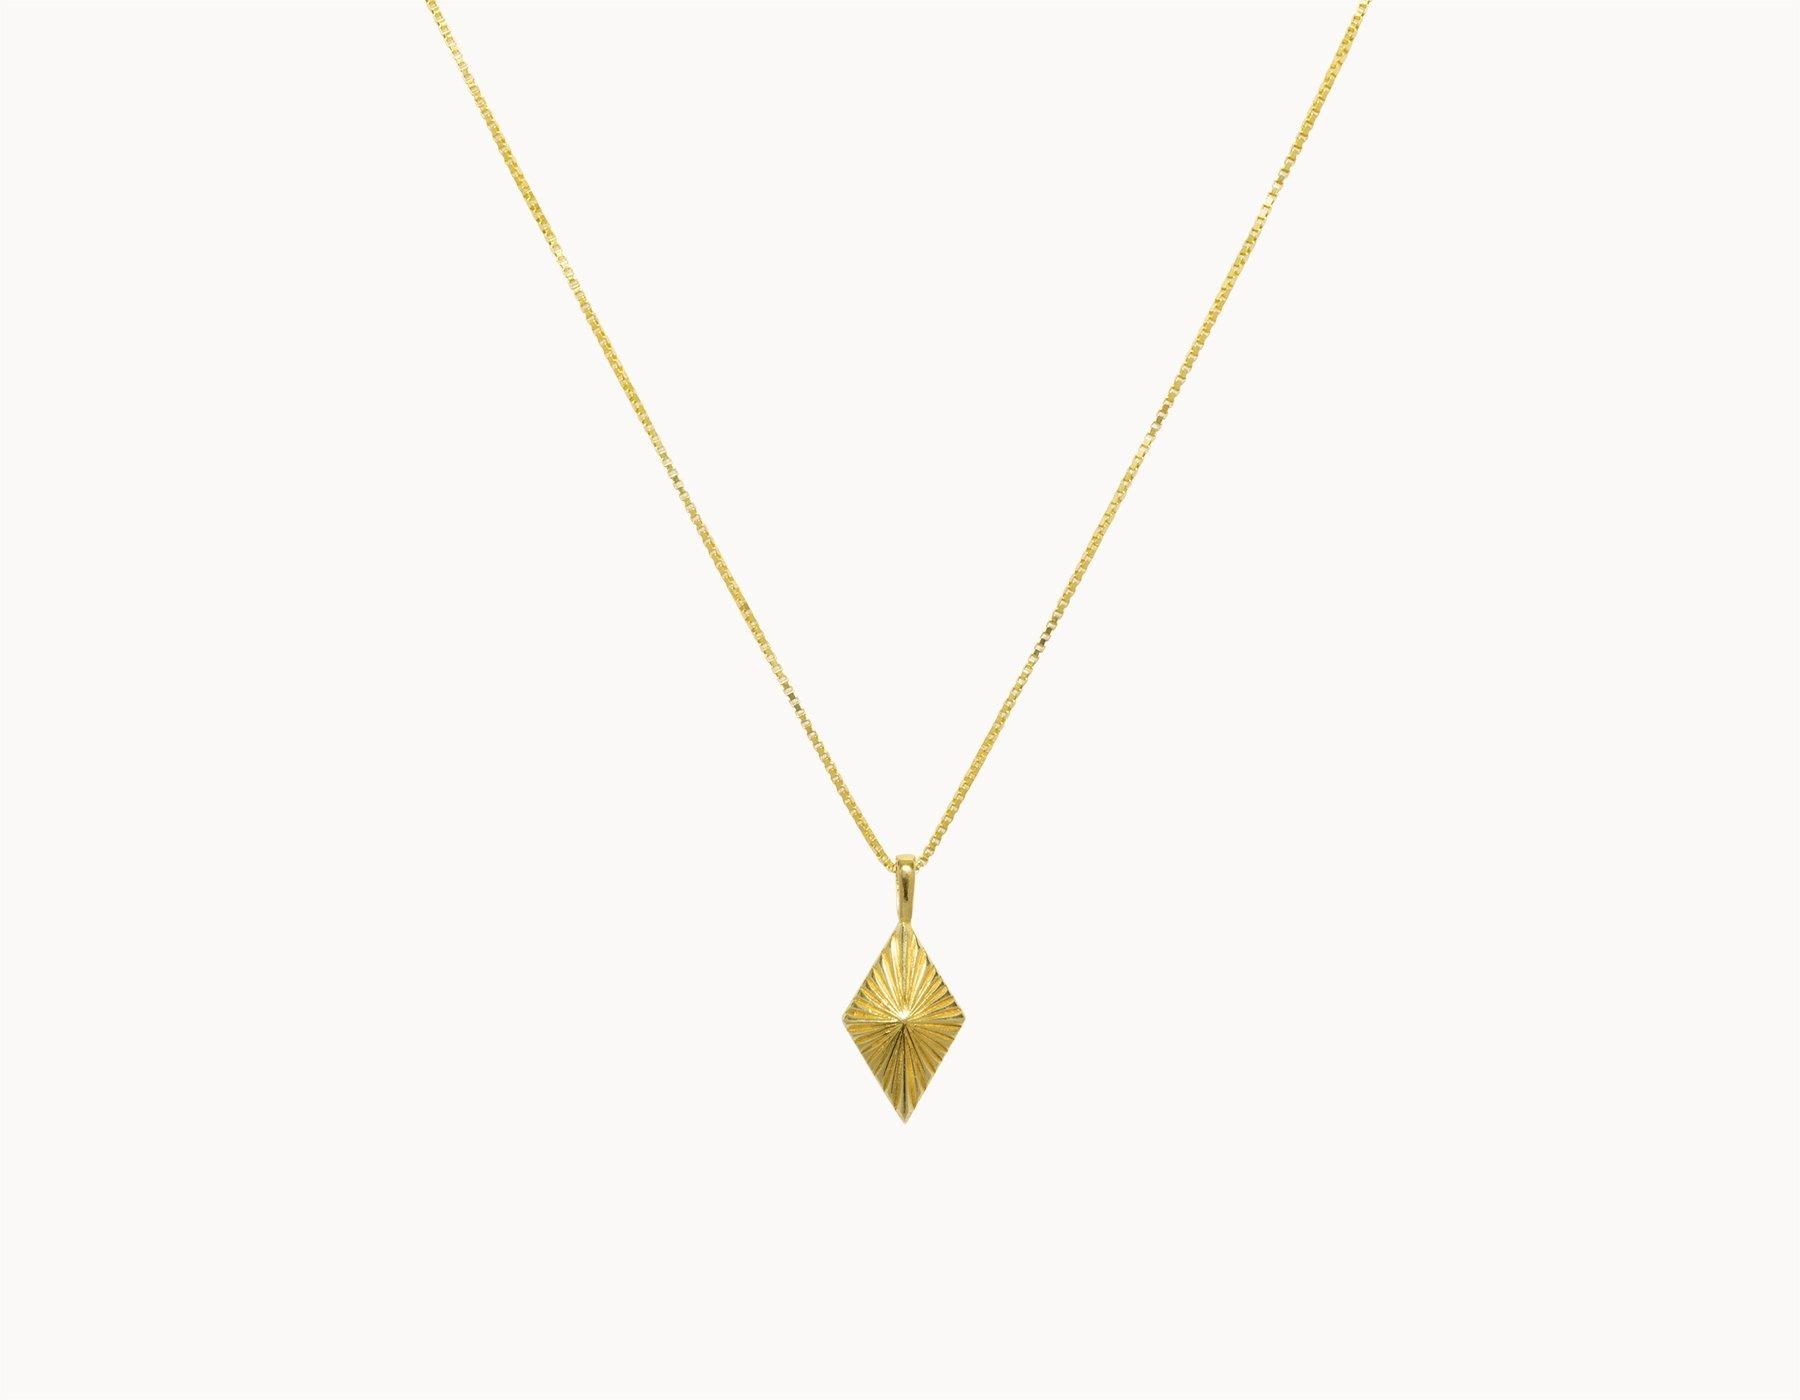 flawed  luminous ketting  - goud